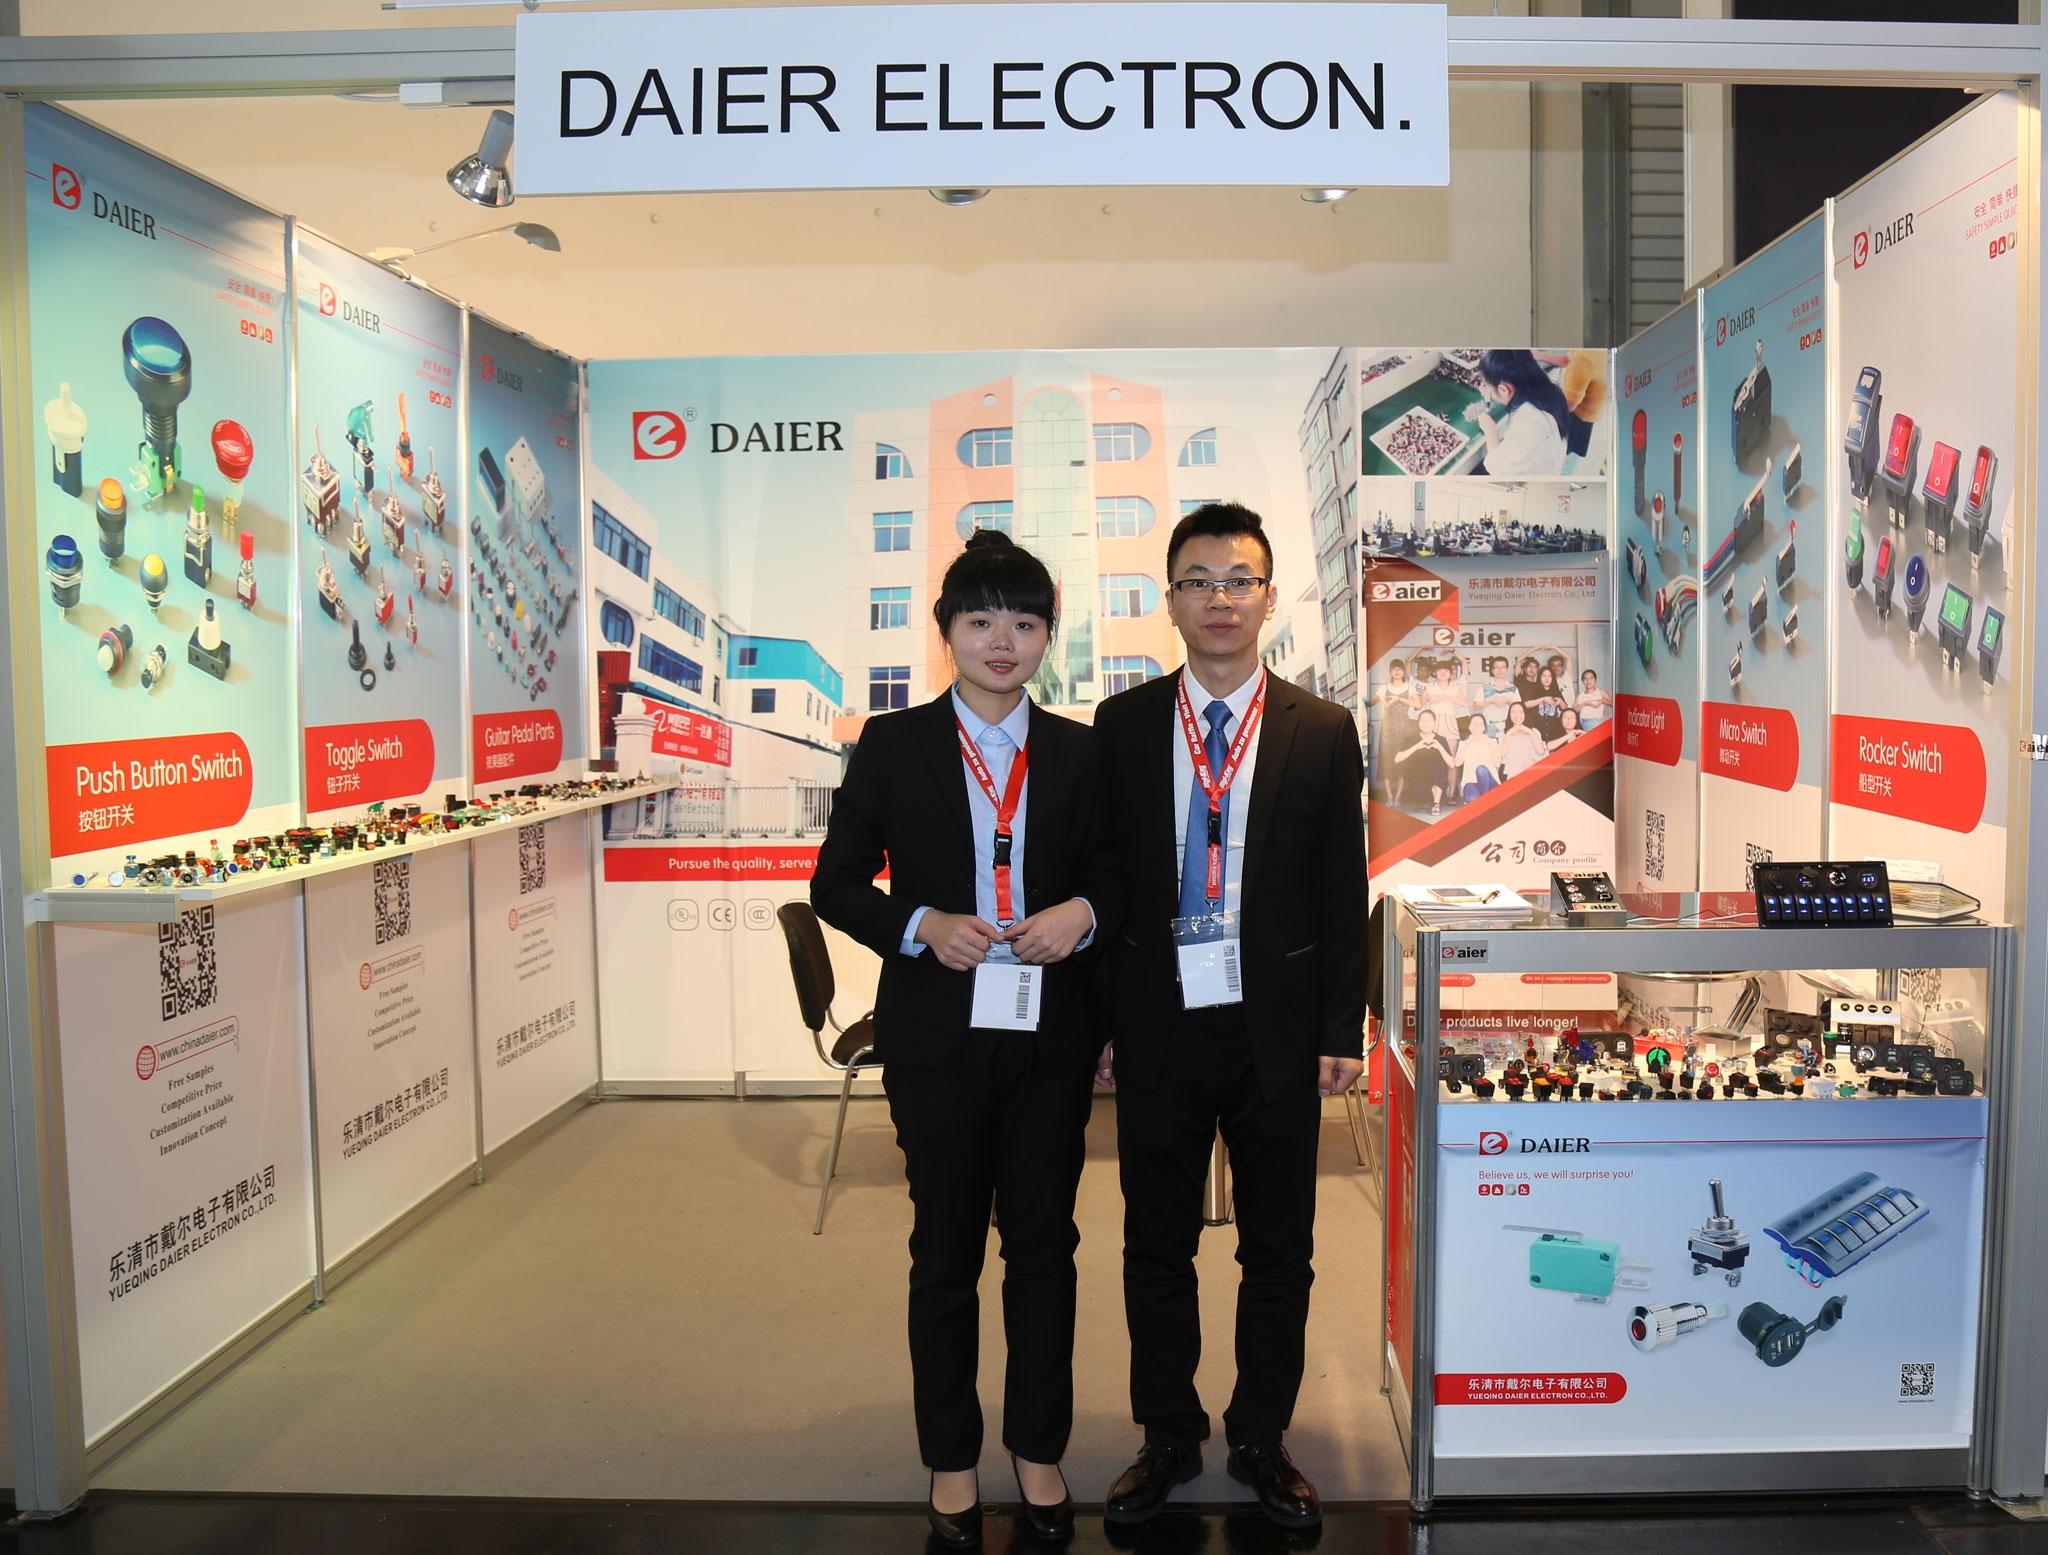 2016 Munich Electronica-Daier booth